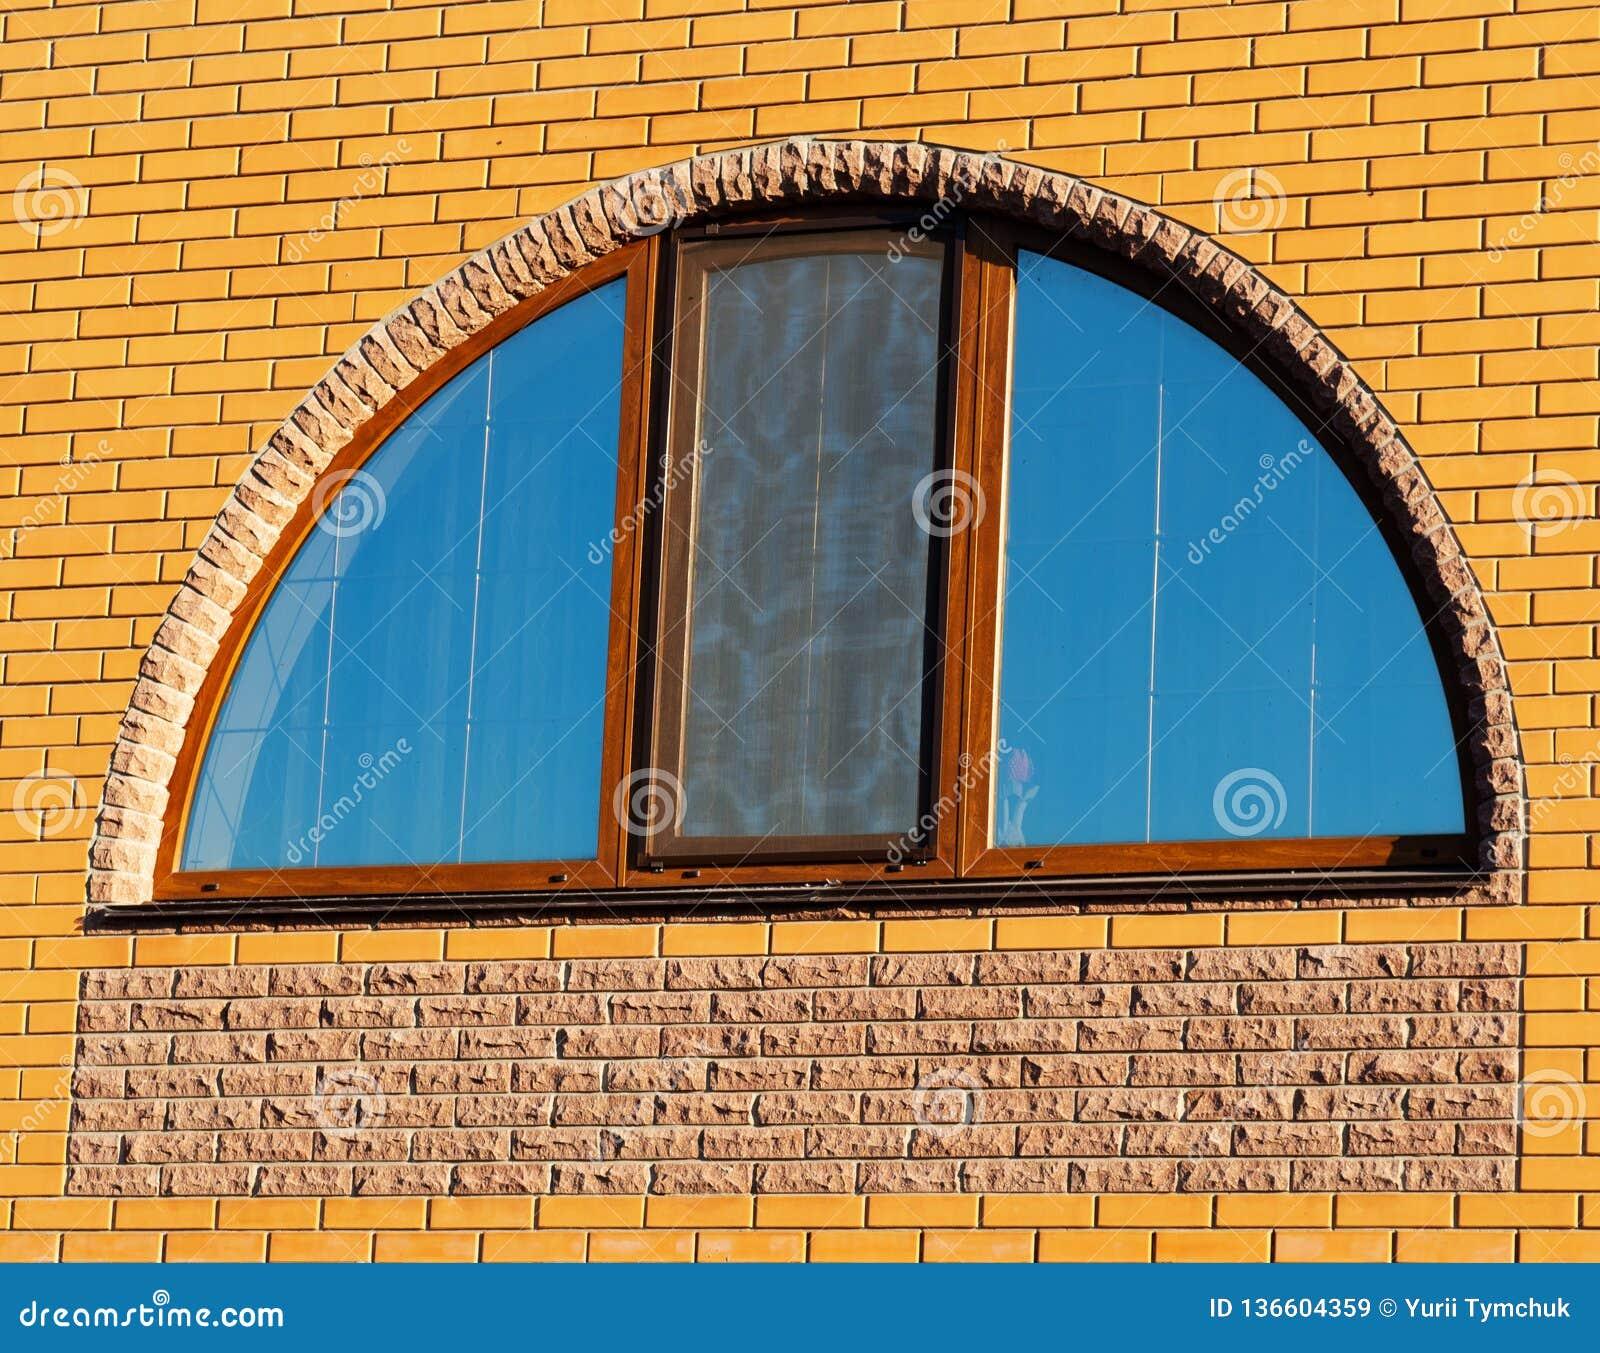 Half Moon Window On The Brick Wall Stock Image Image Of House Closeup 136604359